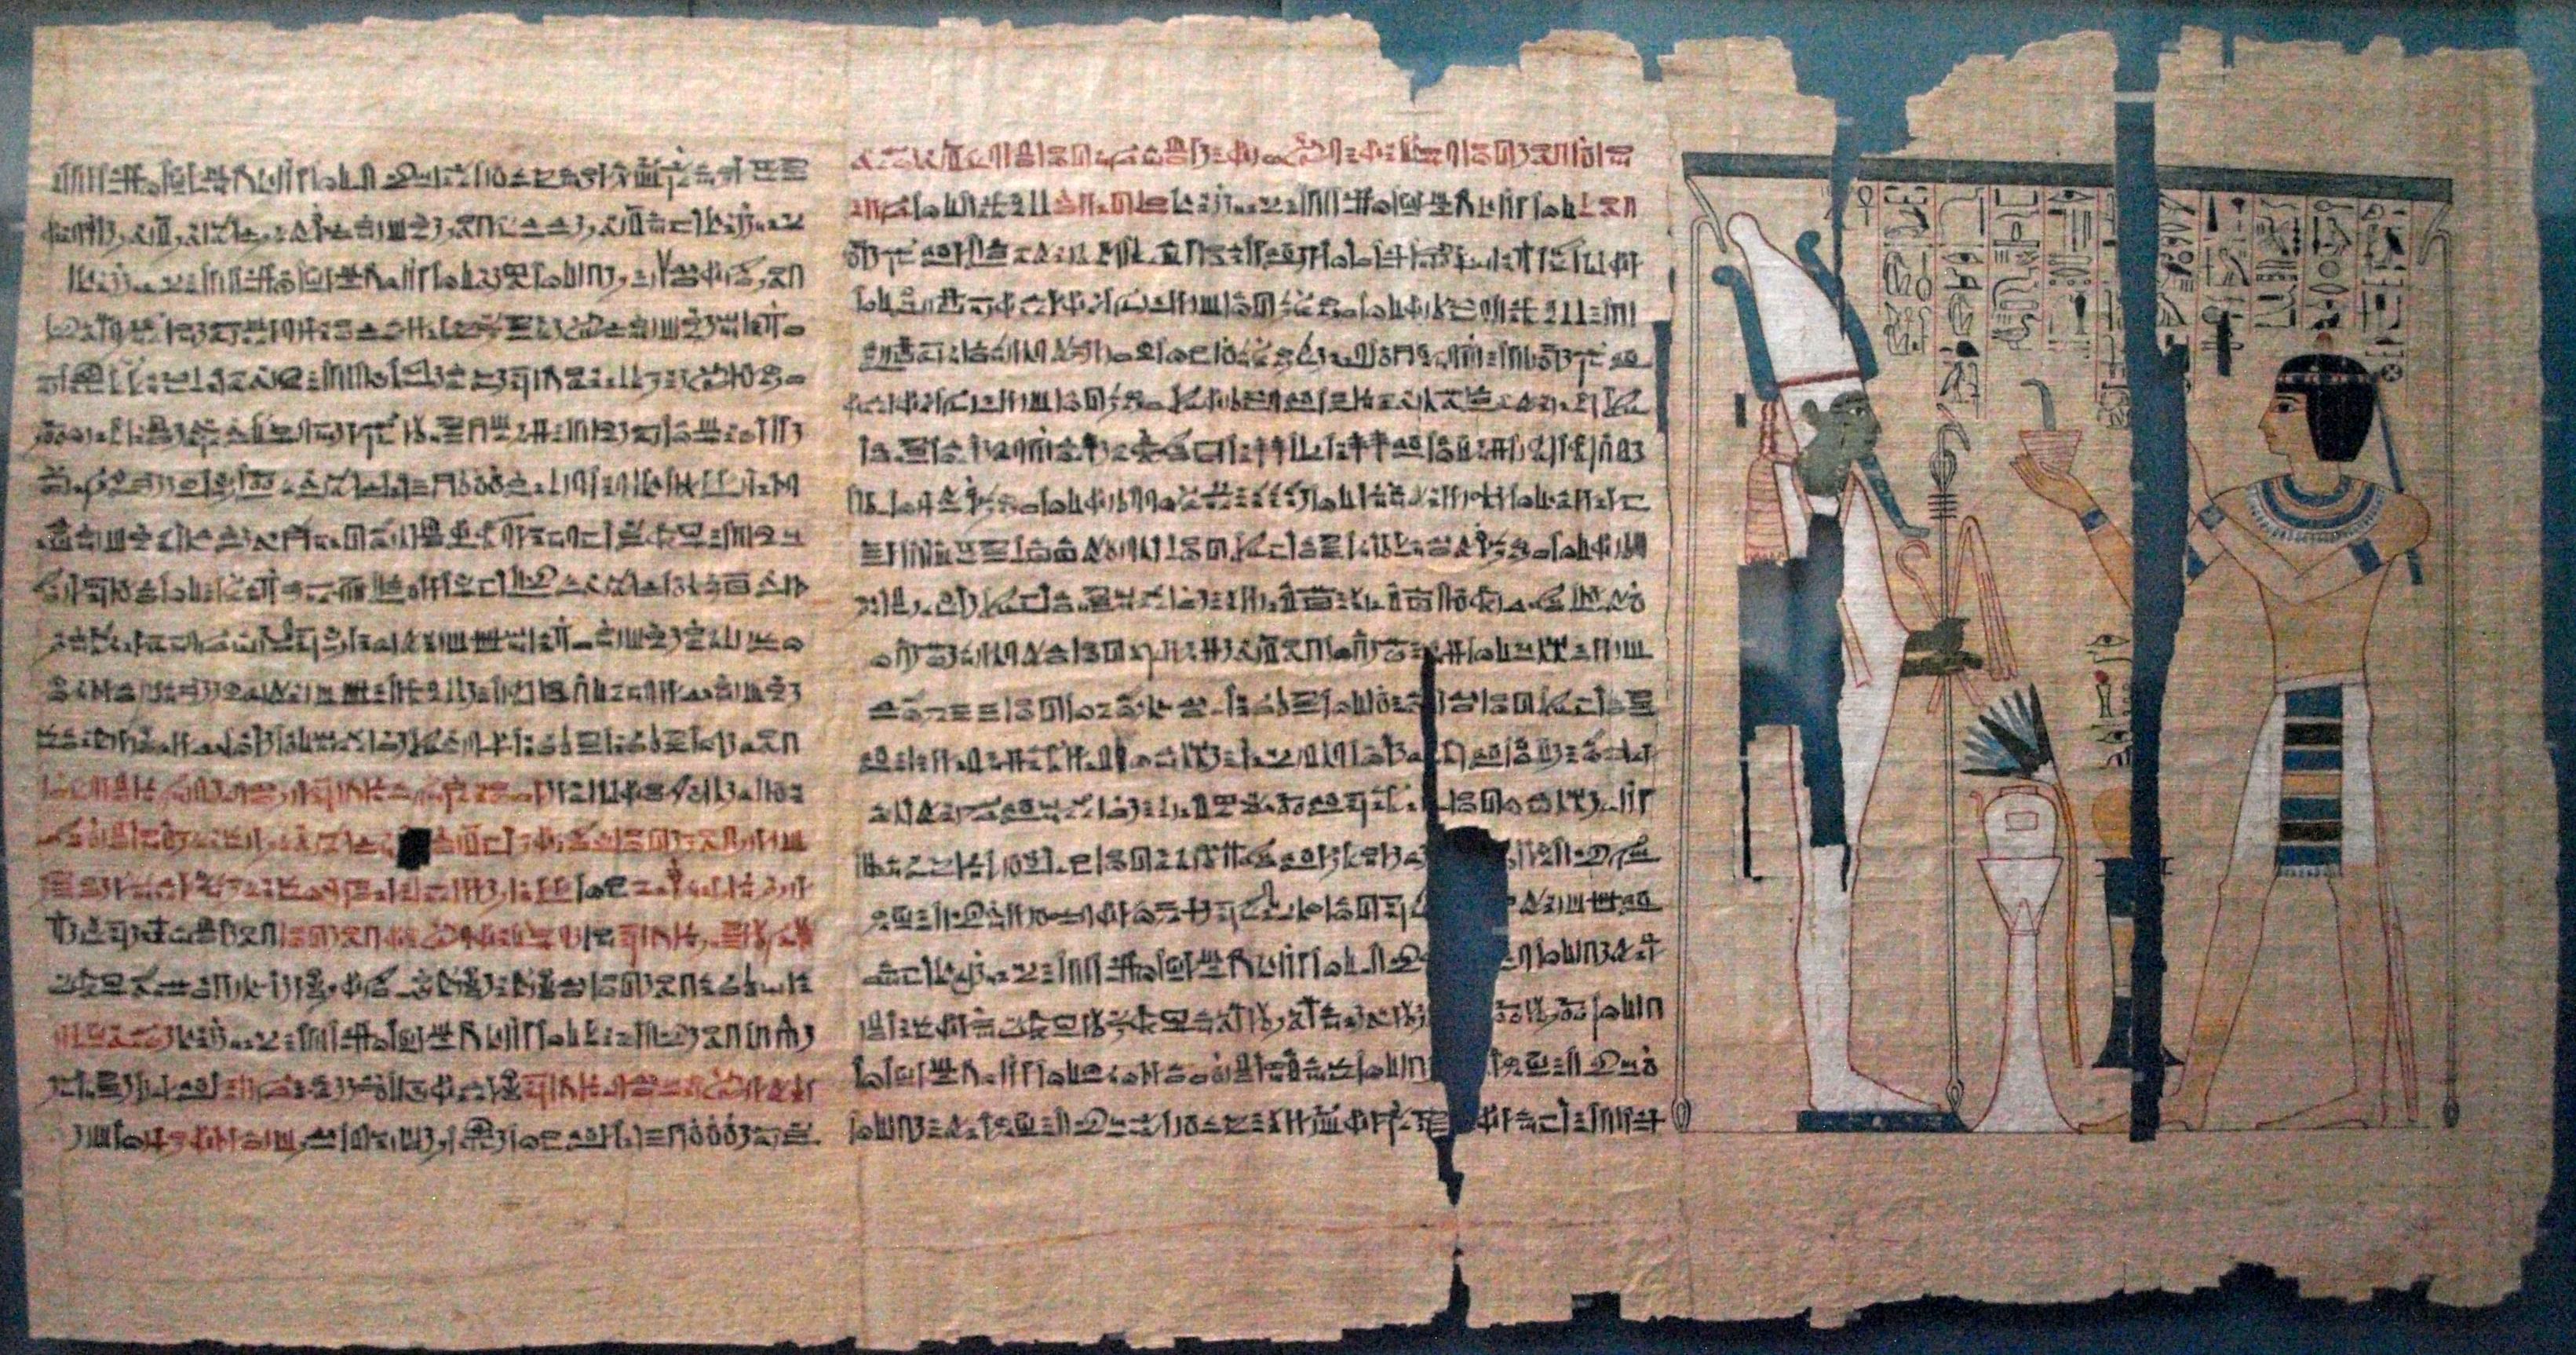 http://upload.wikimedia.org/wikipedia/commons/3/30/PinedjemIIBookOfTheDead-BritishMuseum-August21-08.jpg